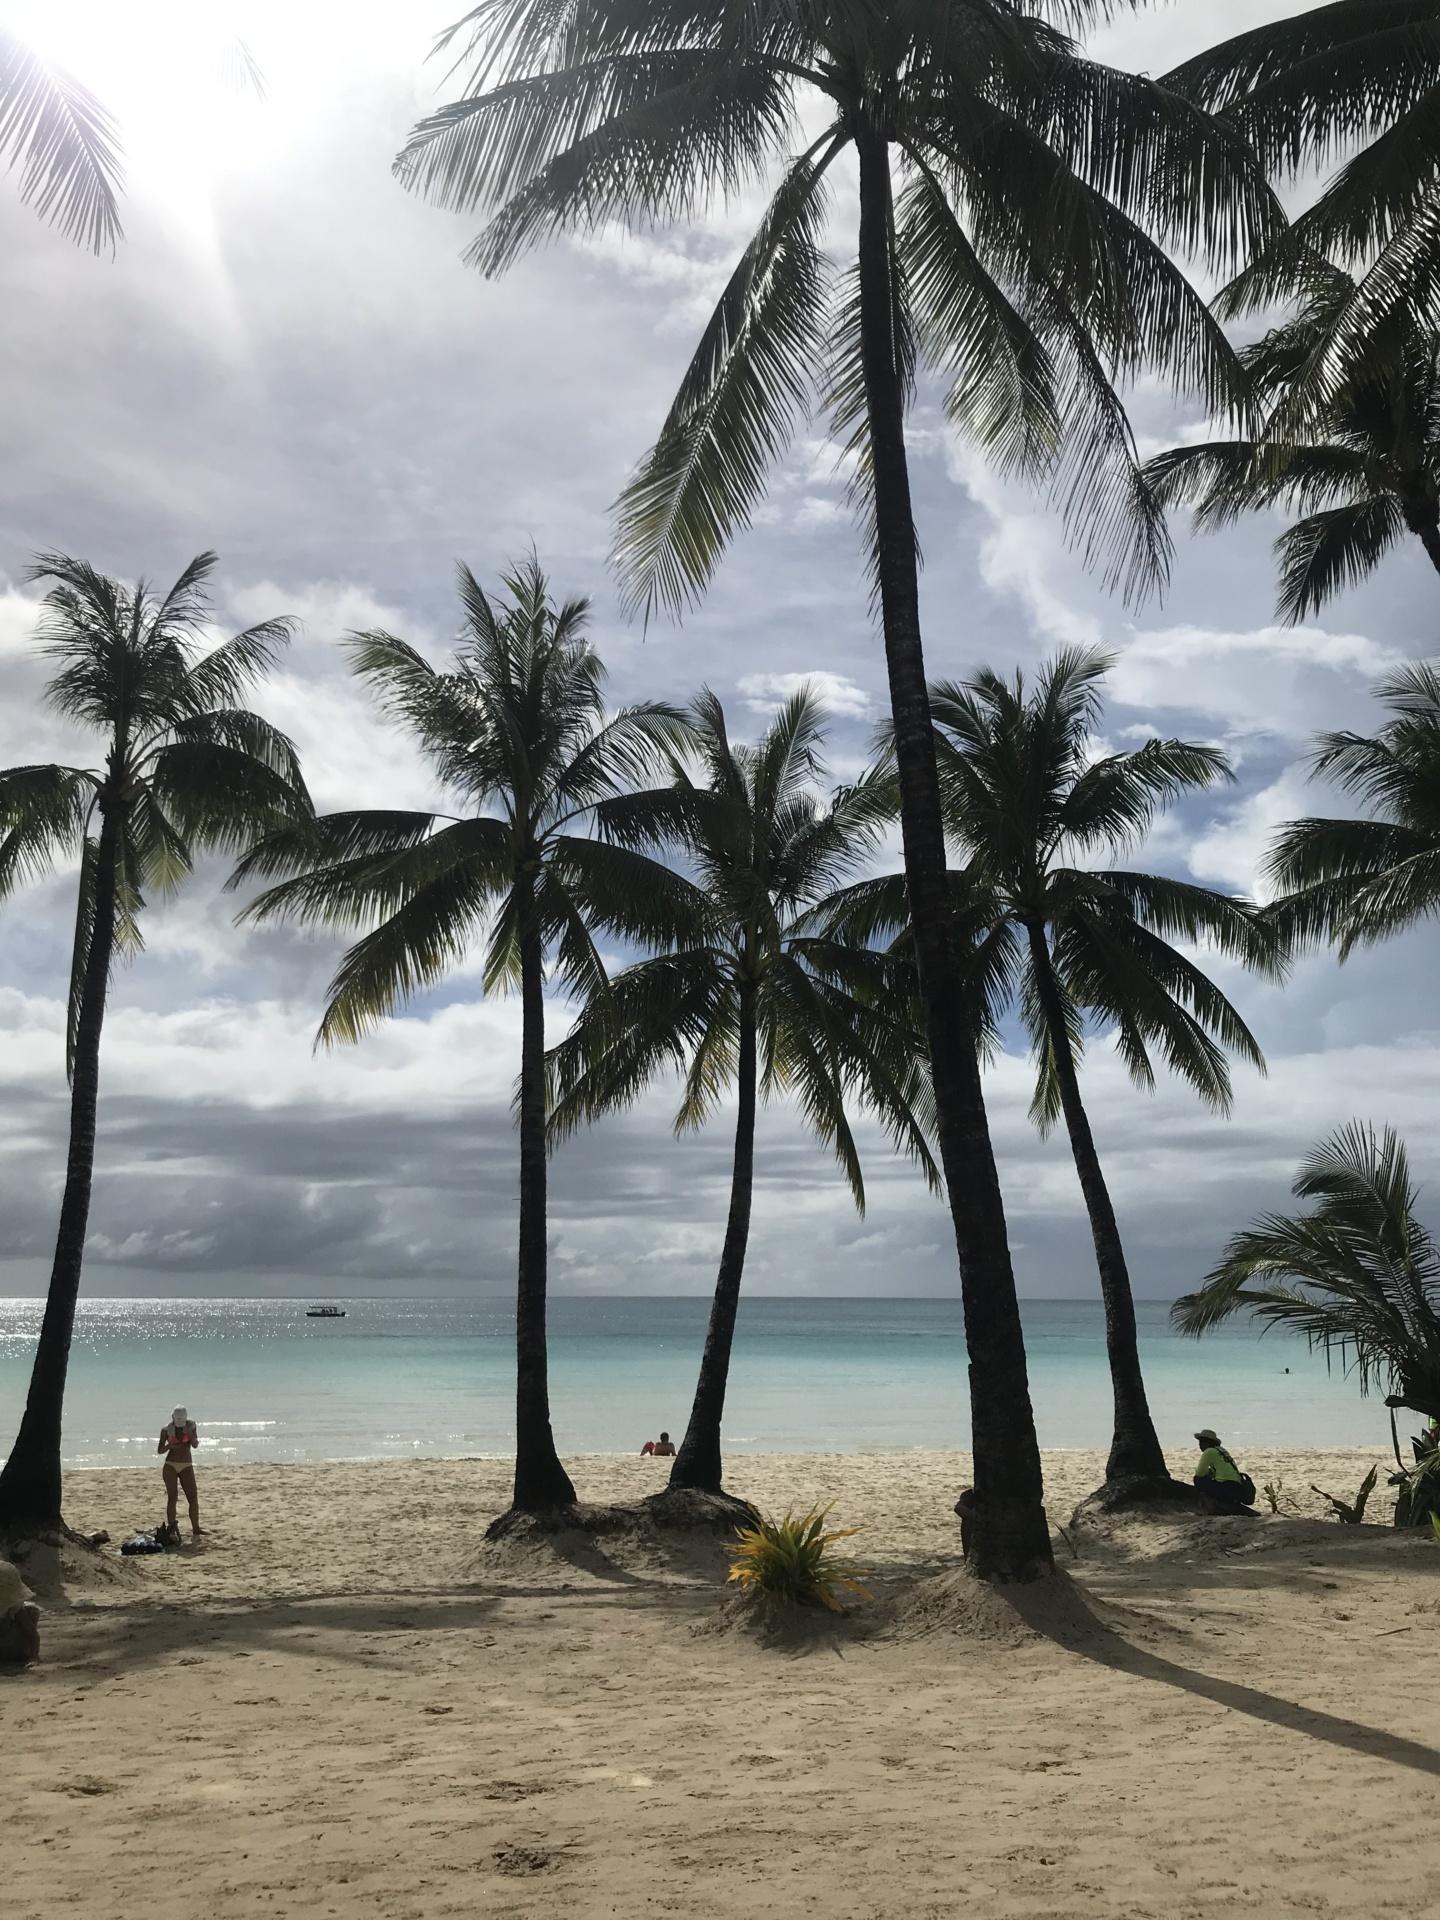 Wanderlustbee - Philippines itinerary, Boracay